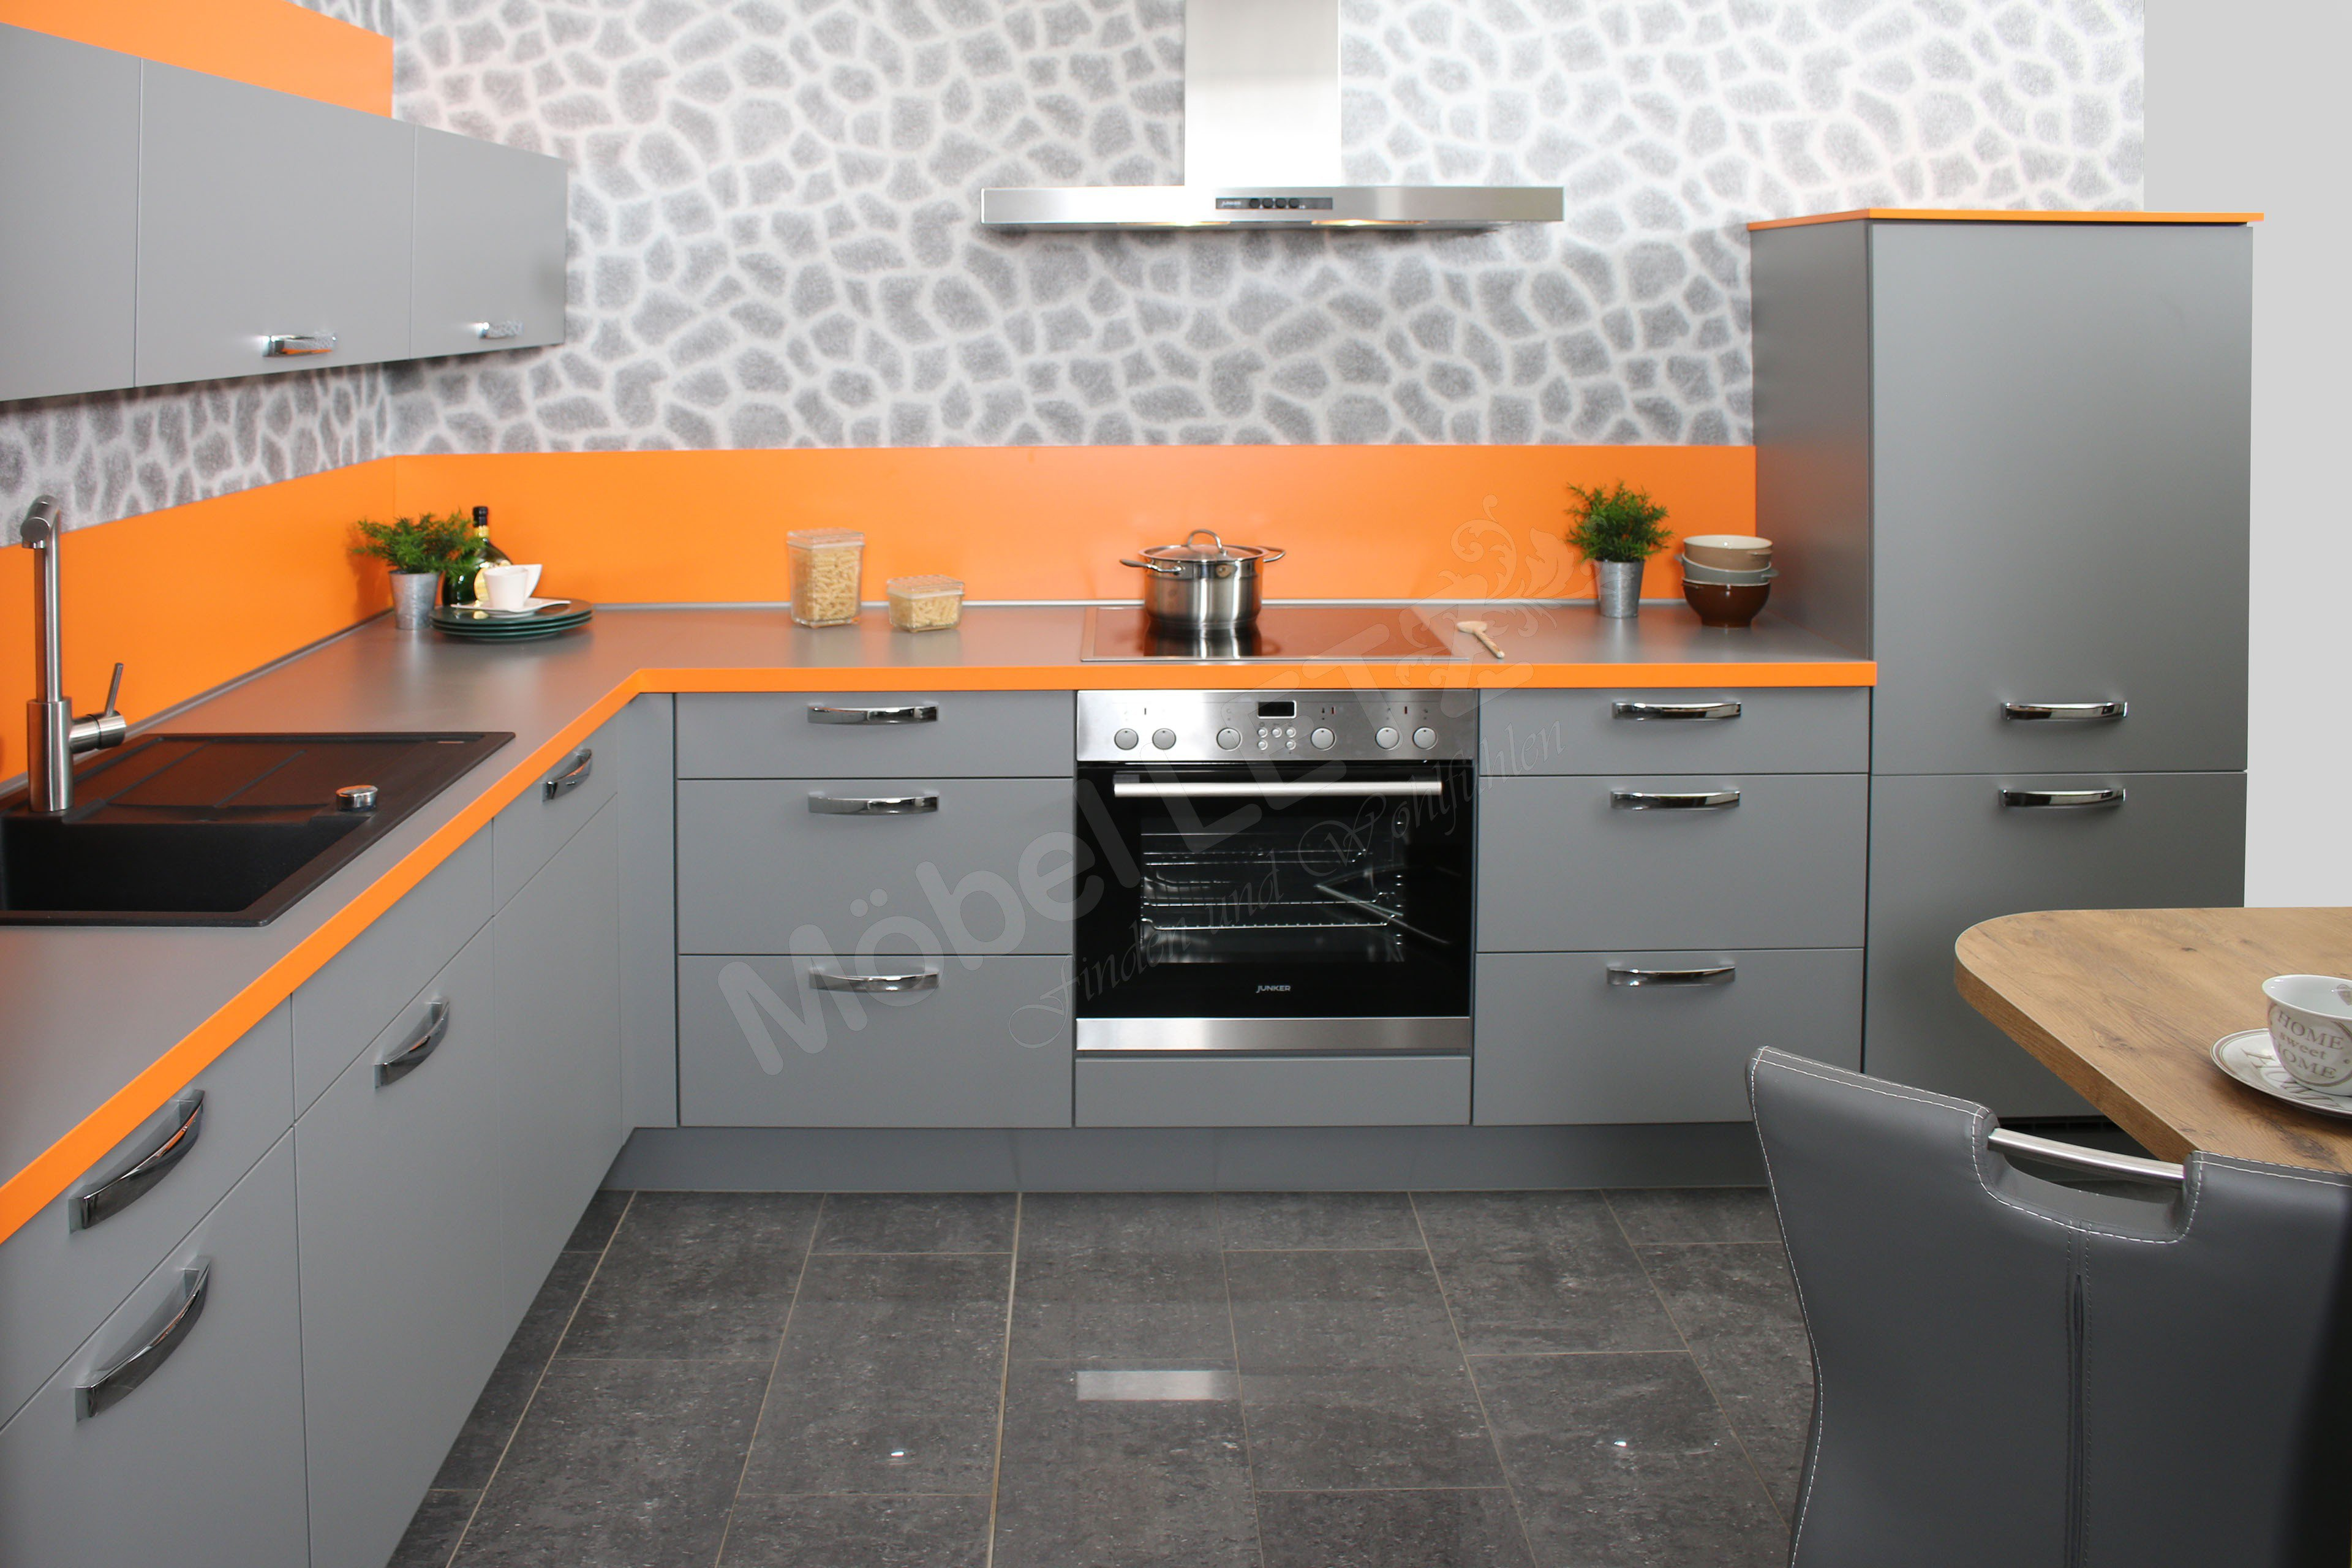 nobilia k chen laser eckk che in mineralgrau orange m bel letz ihr online shop. Black Bedroom Furniture Sets. Home Design Ideas